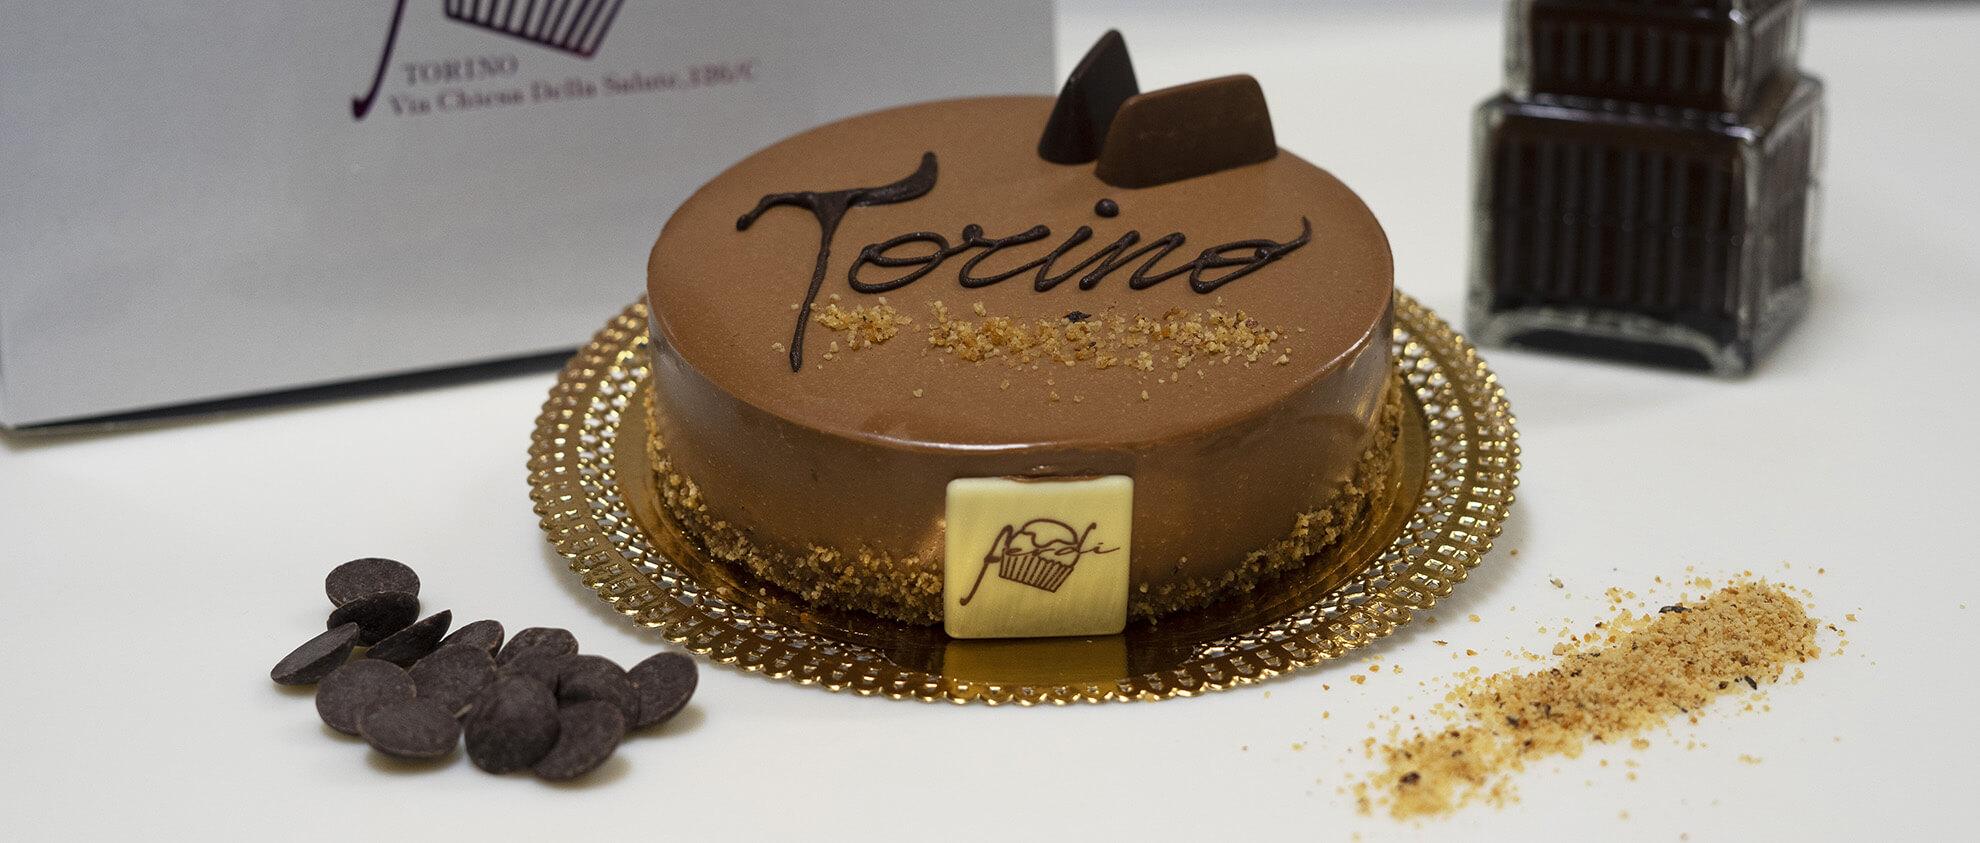 La Torta Torino